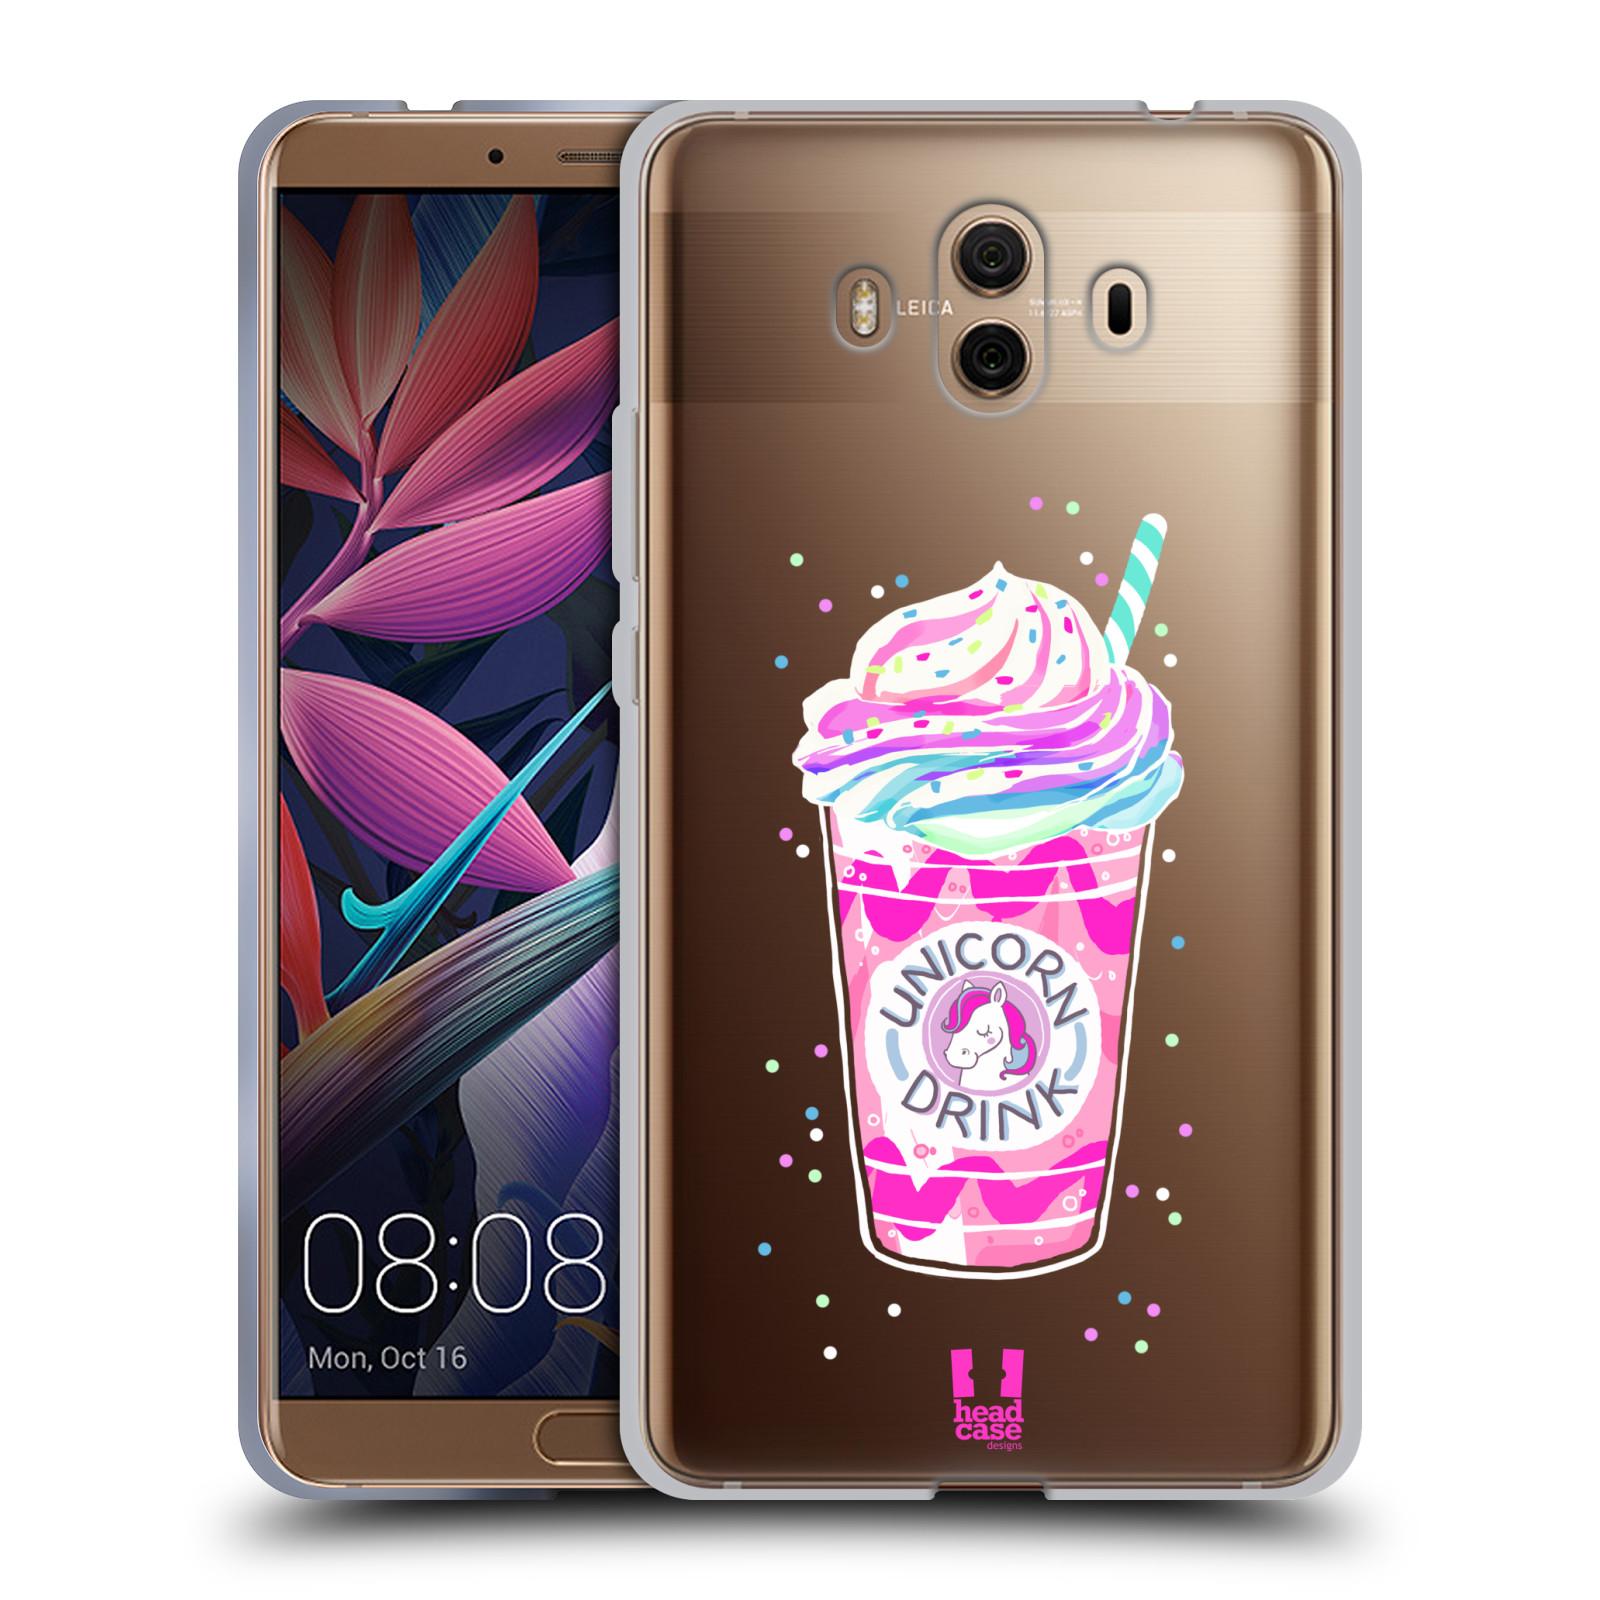 Silikonové pouzdro na mobil Huawei Mate 10 - Head Case - Unicorn drink